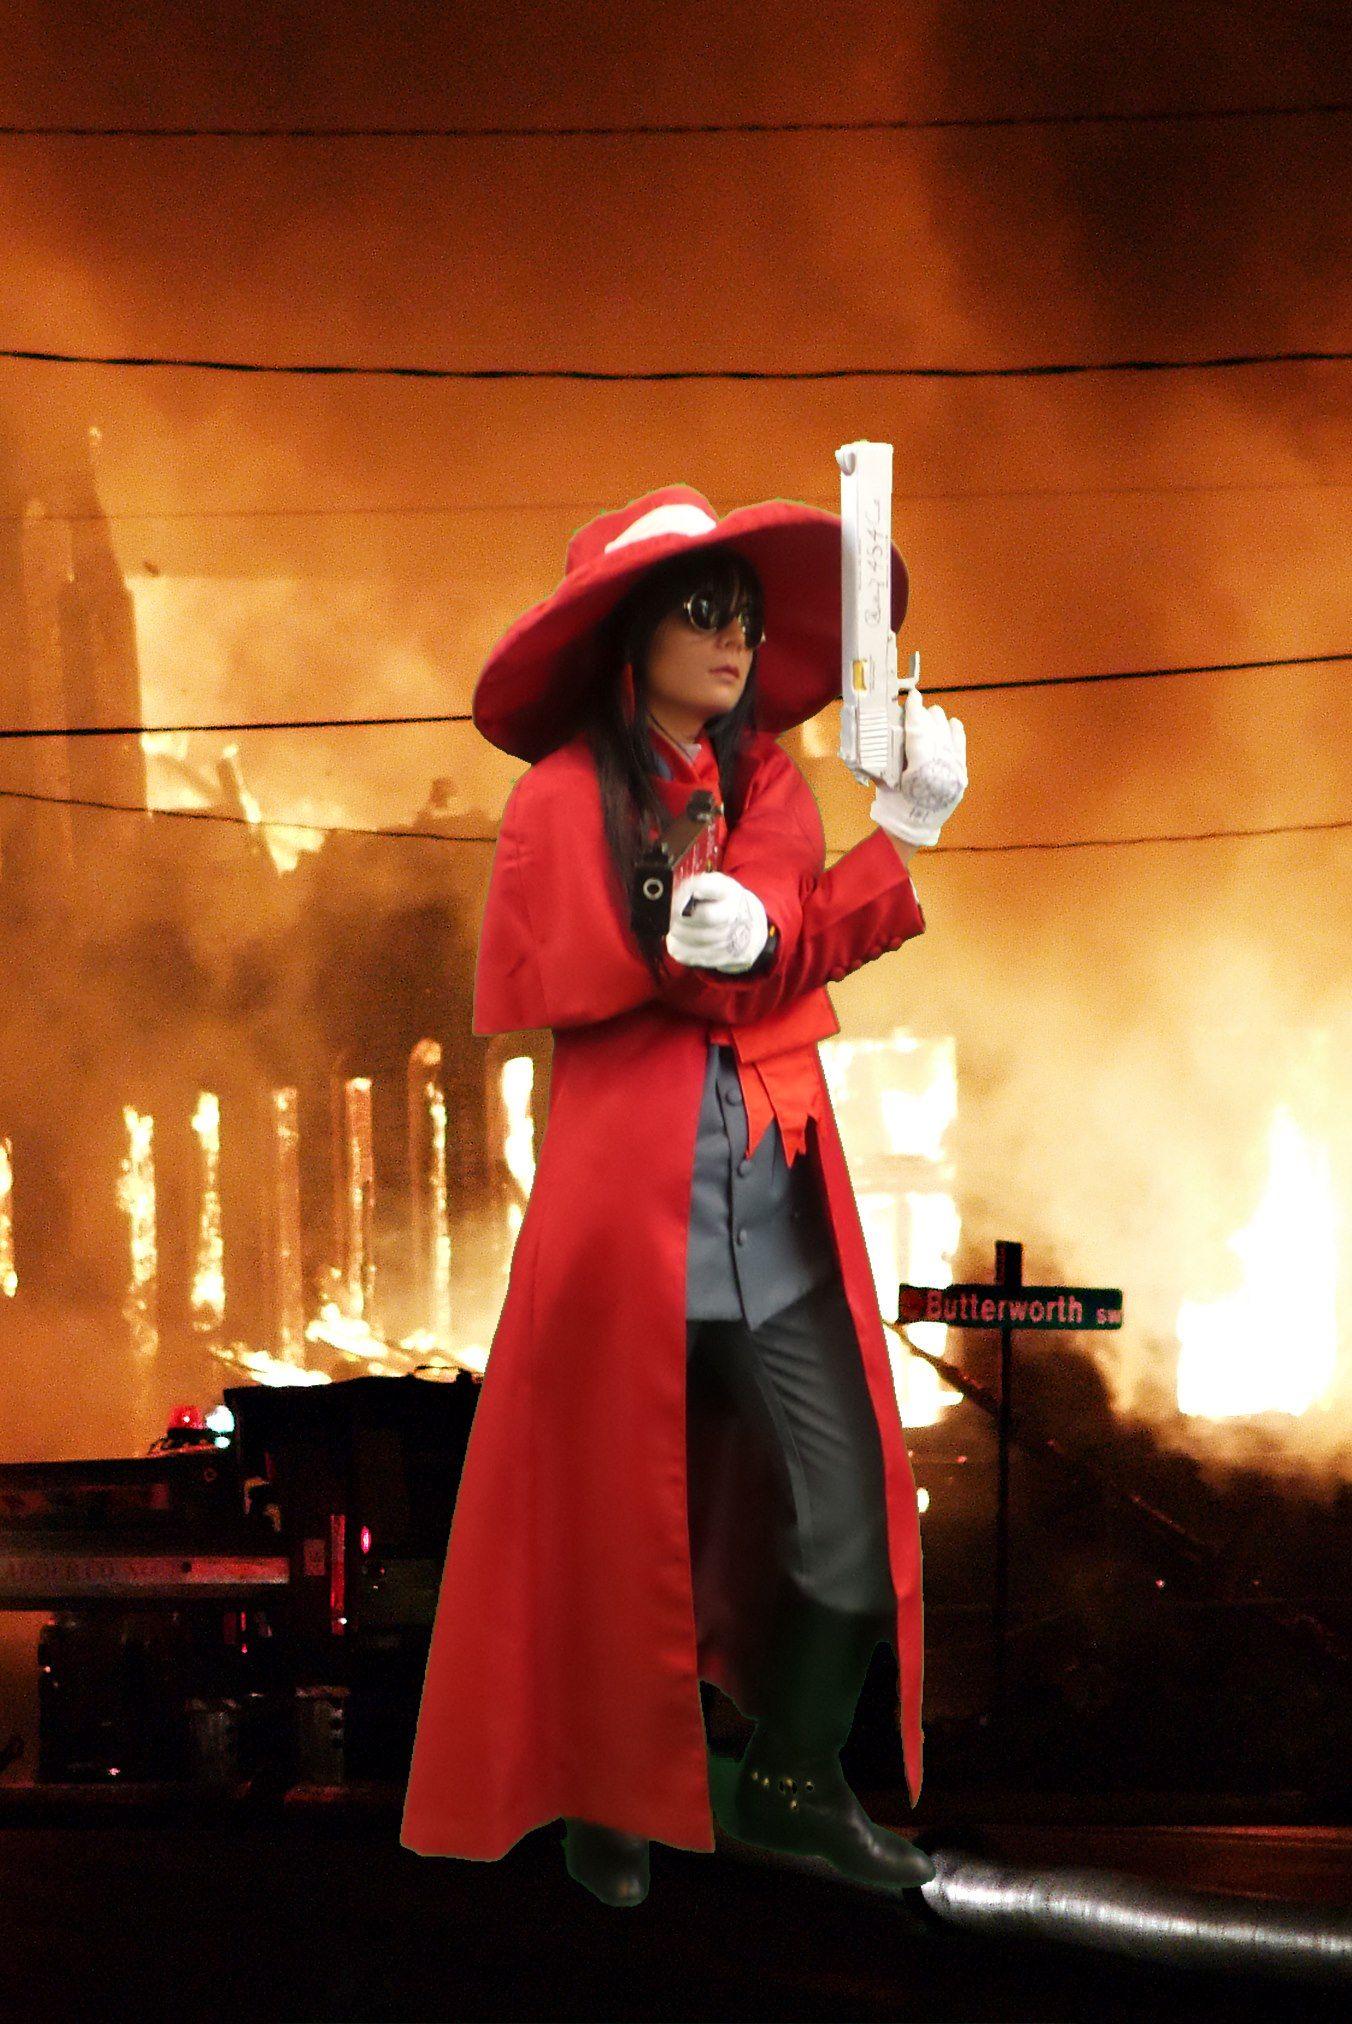 #cosplay #costume #photo #greenscreen #cosmoviex #festivaladelfumetto #fiera #novegro #milano #flames #fire